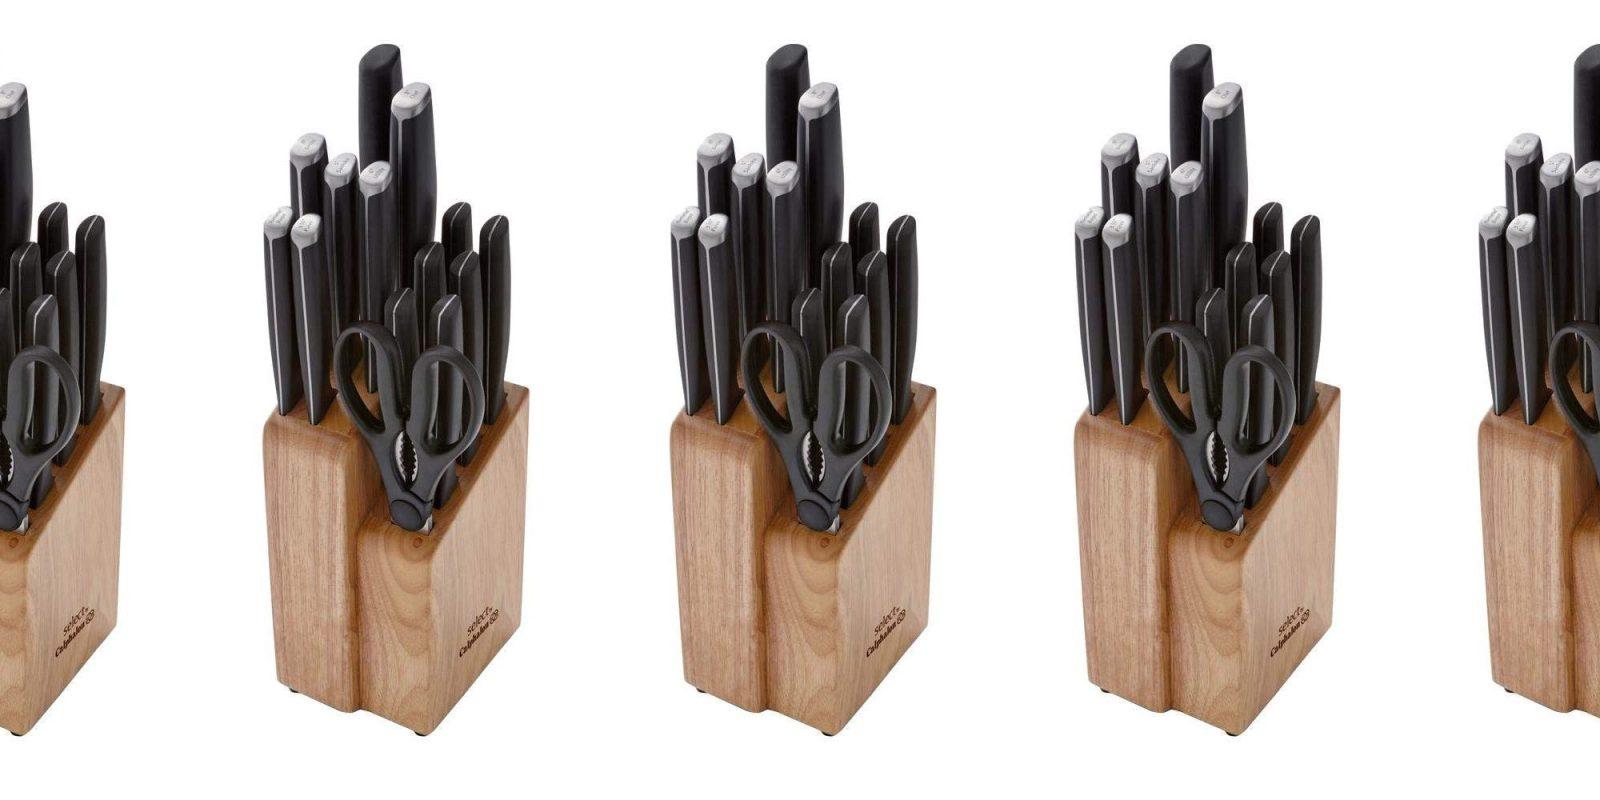 Calphalon Select 15-Piece Knife Block Set w/ 10 yr  warranty